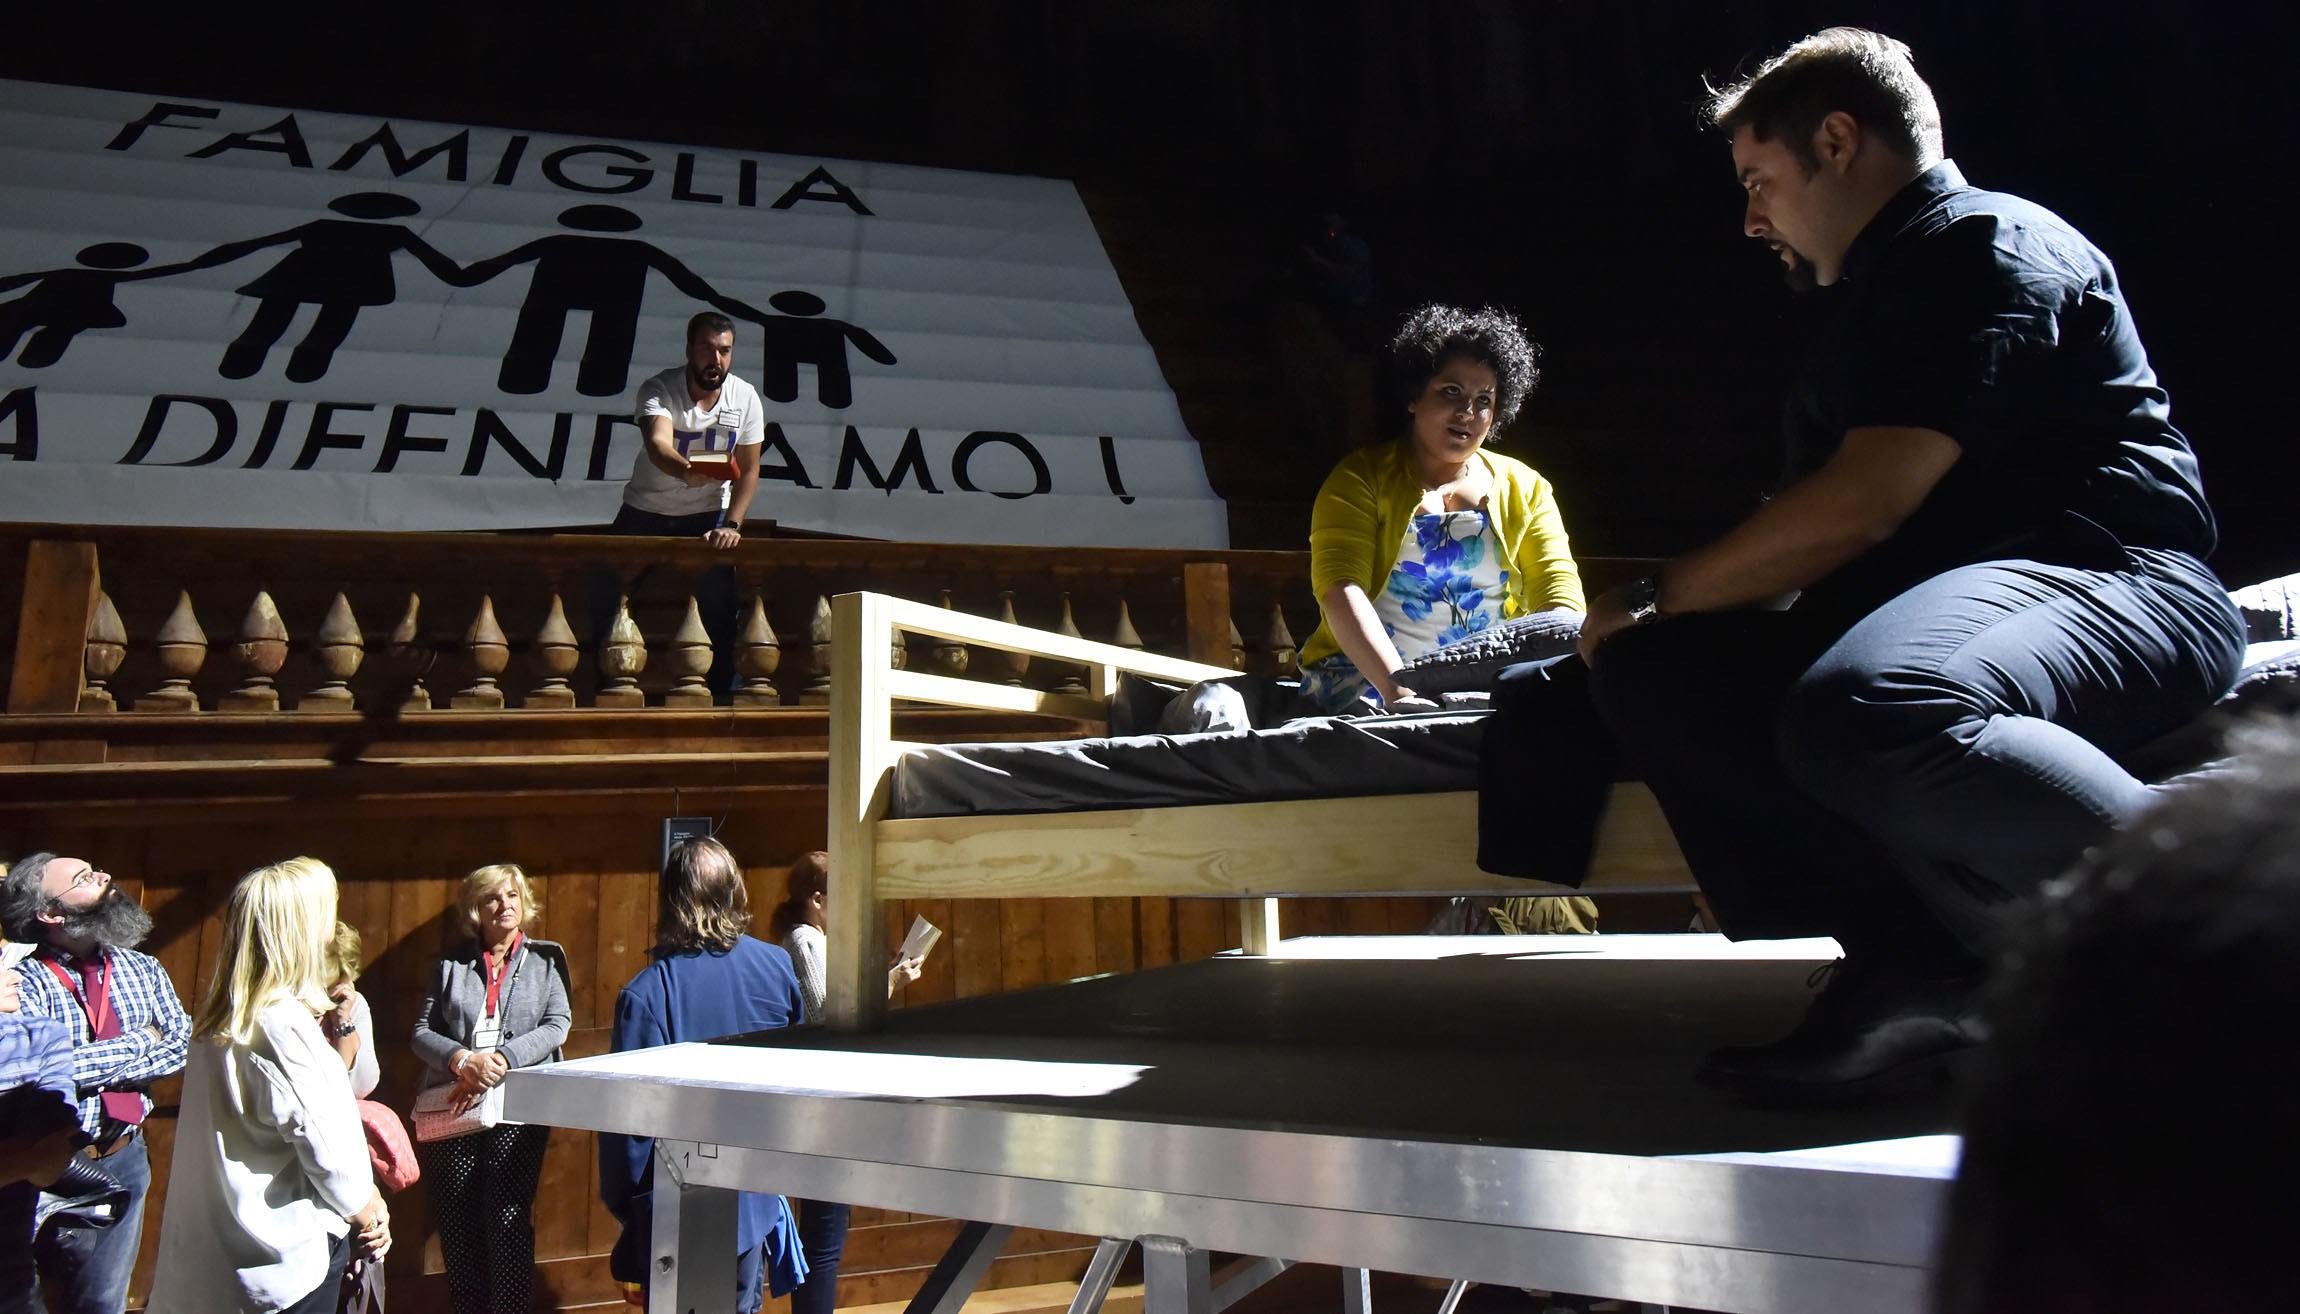 Stiffelio, Giuseppe Verdi, Parma, Festival Verdi, Graham Vick, Roberto Ricci, Luciano Ganci, Maria Katzarava, Emanuele Cordaro,